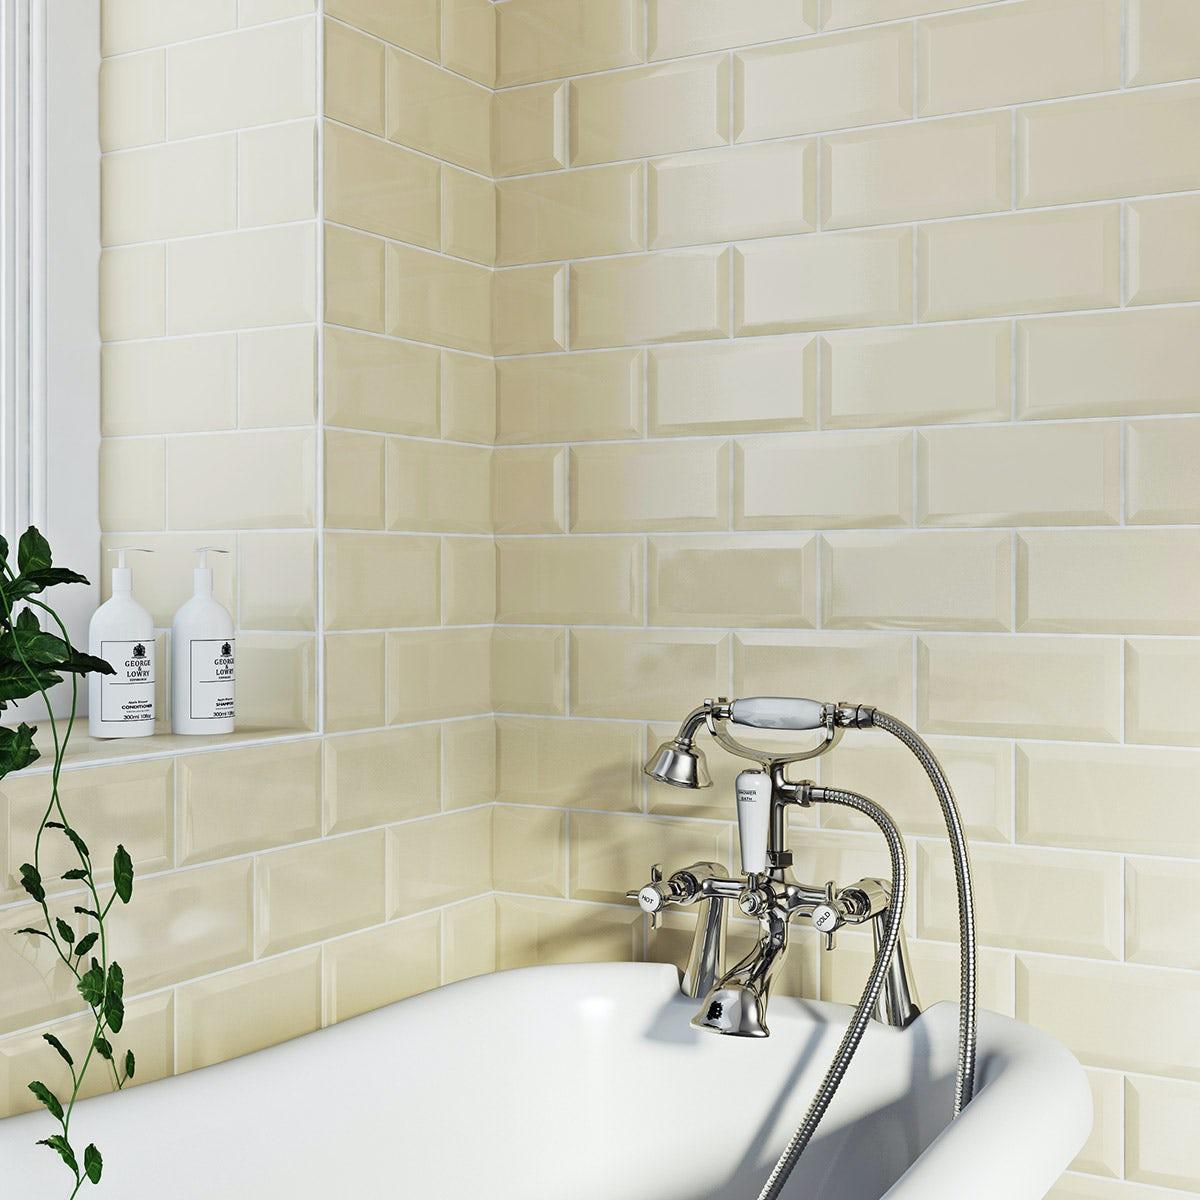 How To Put Up Tiles In A Bathroom: British Ceramic Tile Metro Bevel Cream Gloss Tile 100mm X